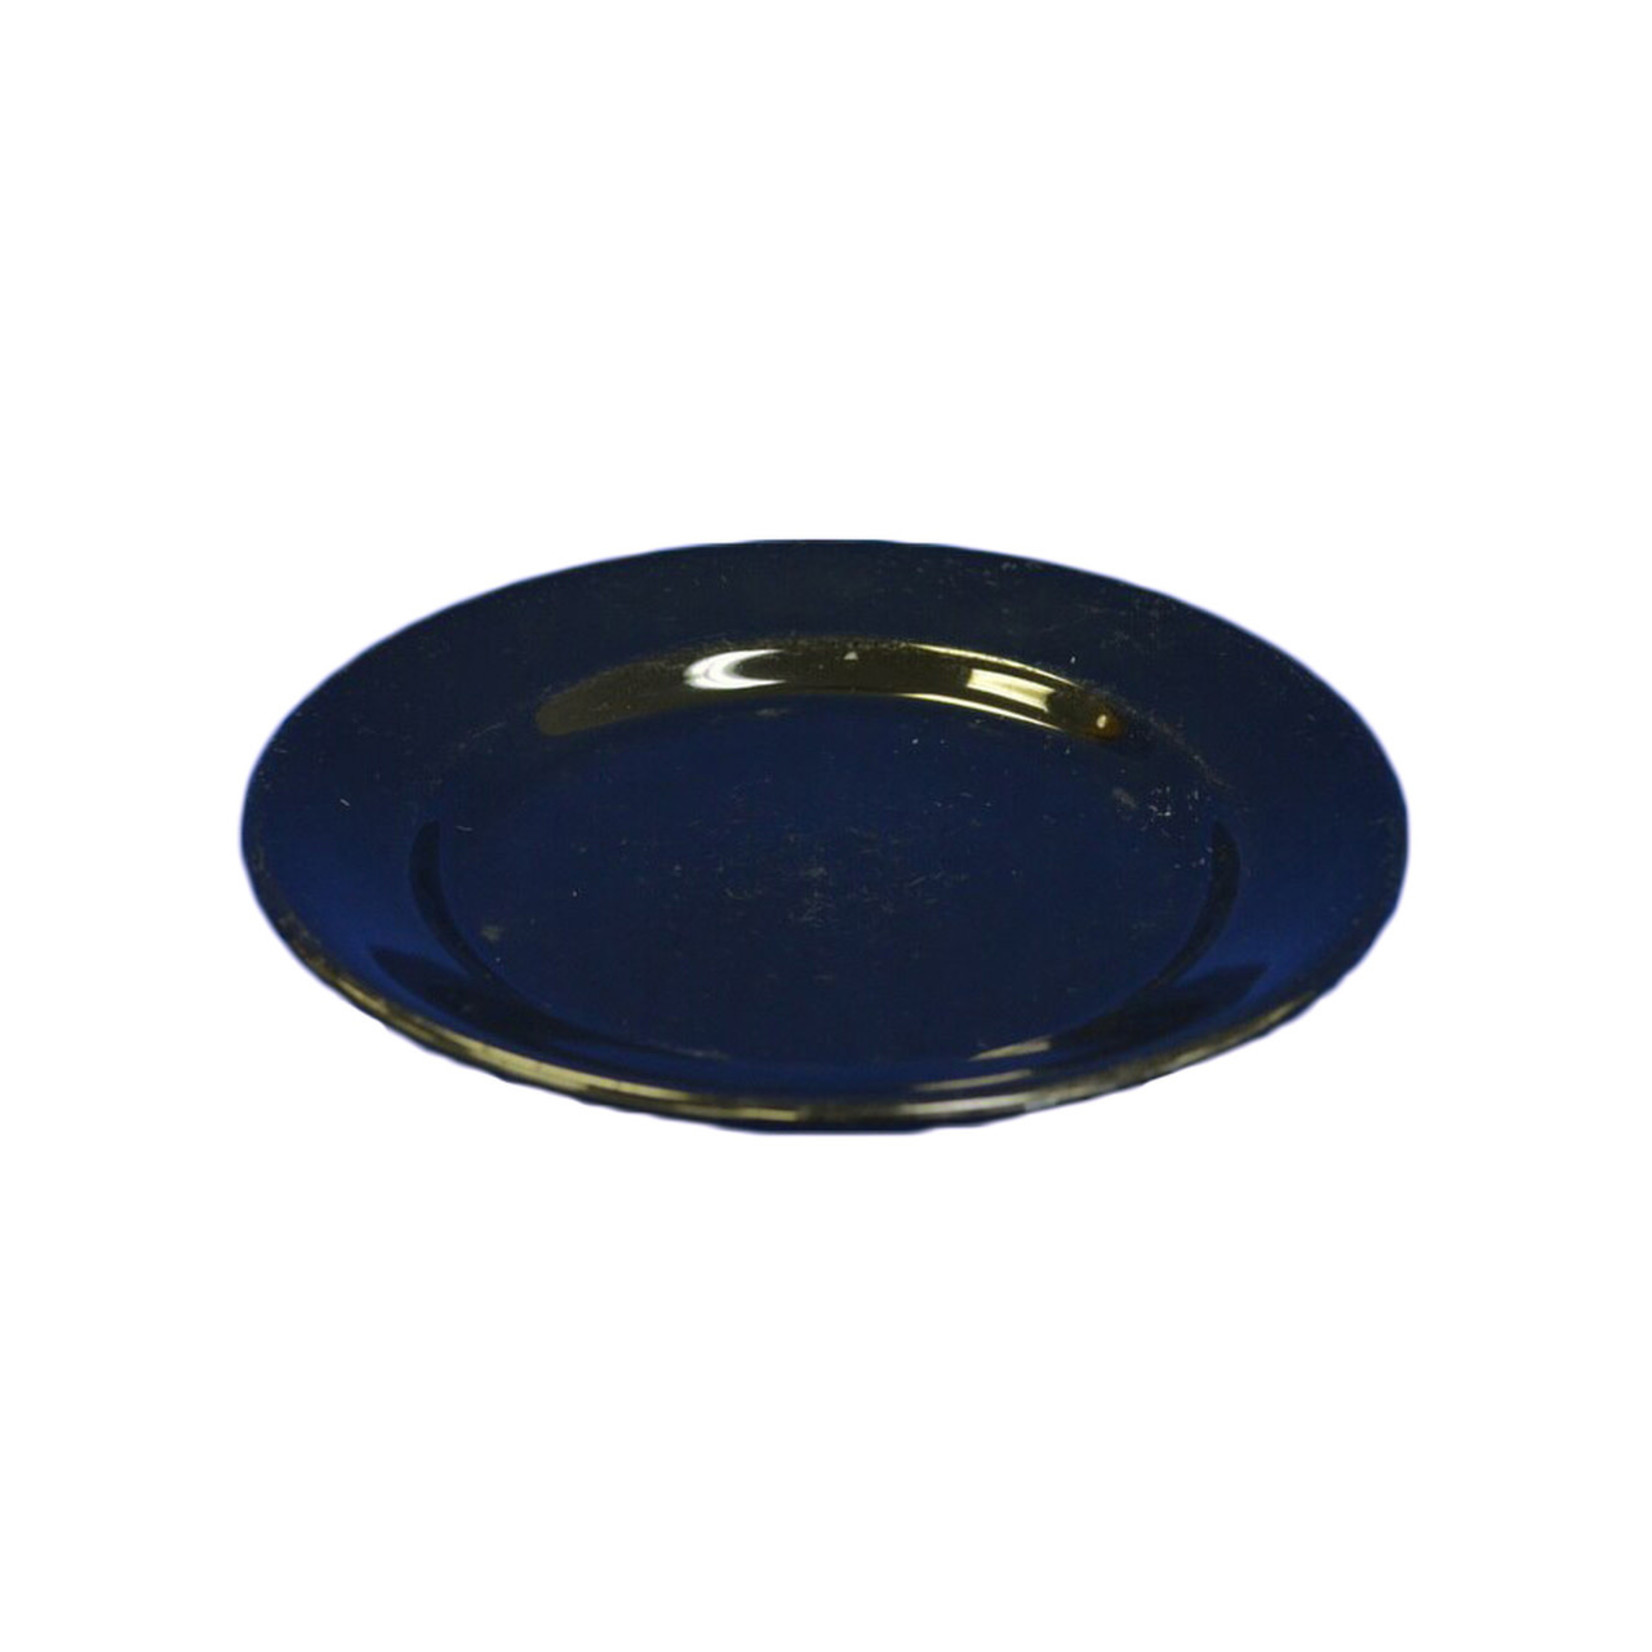 Black Ceramic Small Plate